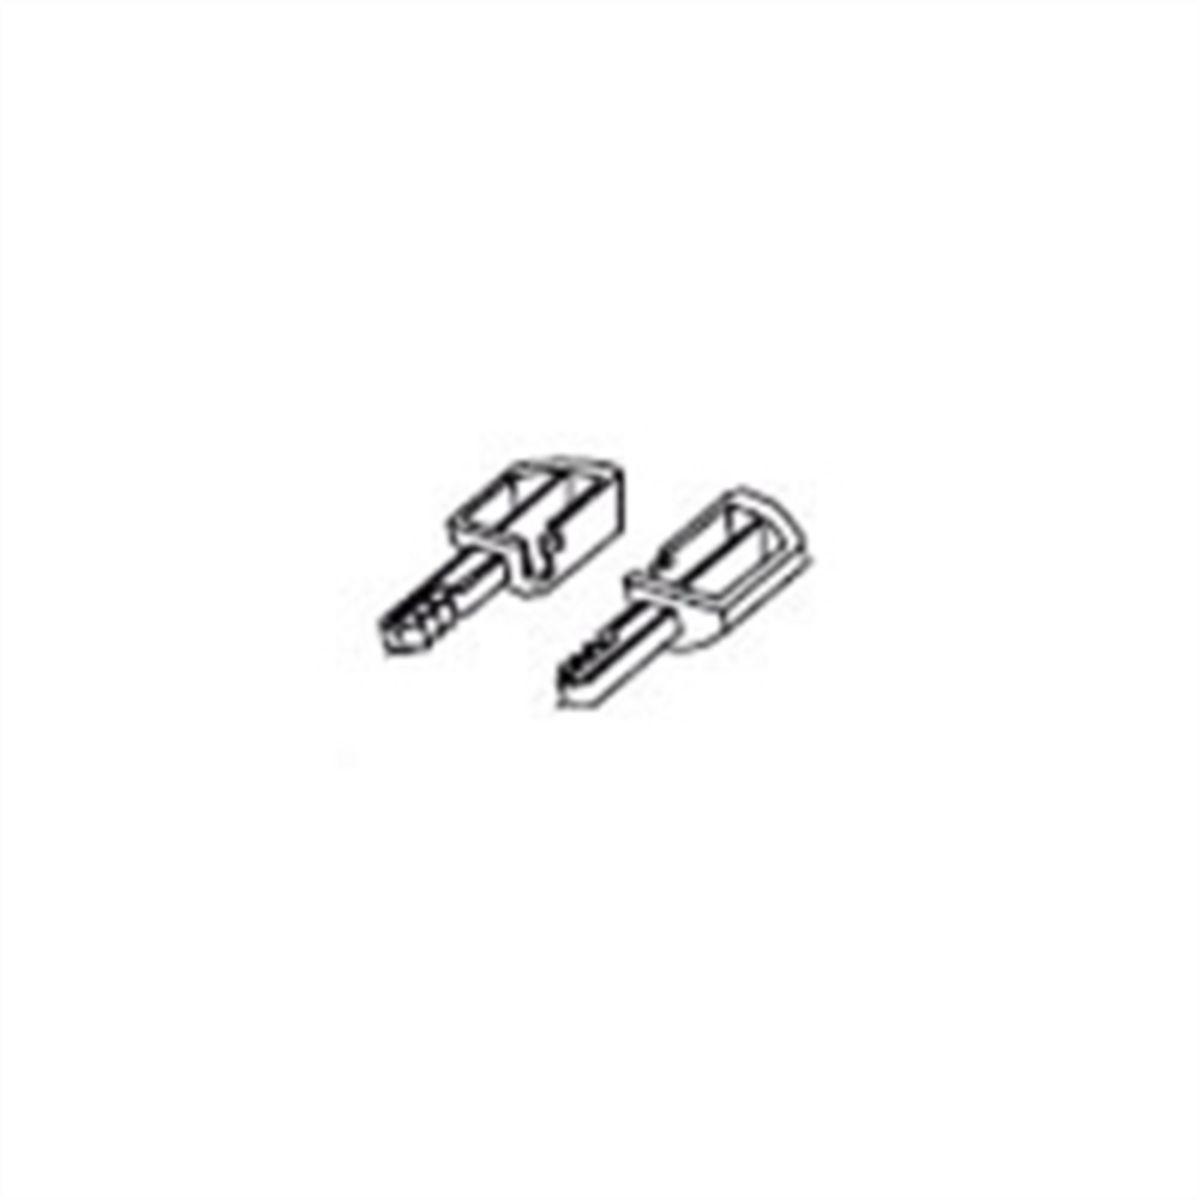 ipr valve wiring diagram database  ingersoll rand button kit for 2112 2115 2112 k75 ford 6 liter powerstroke ipr valve ipr valve